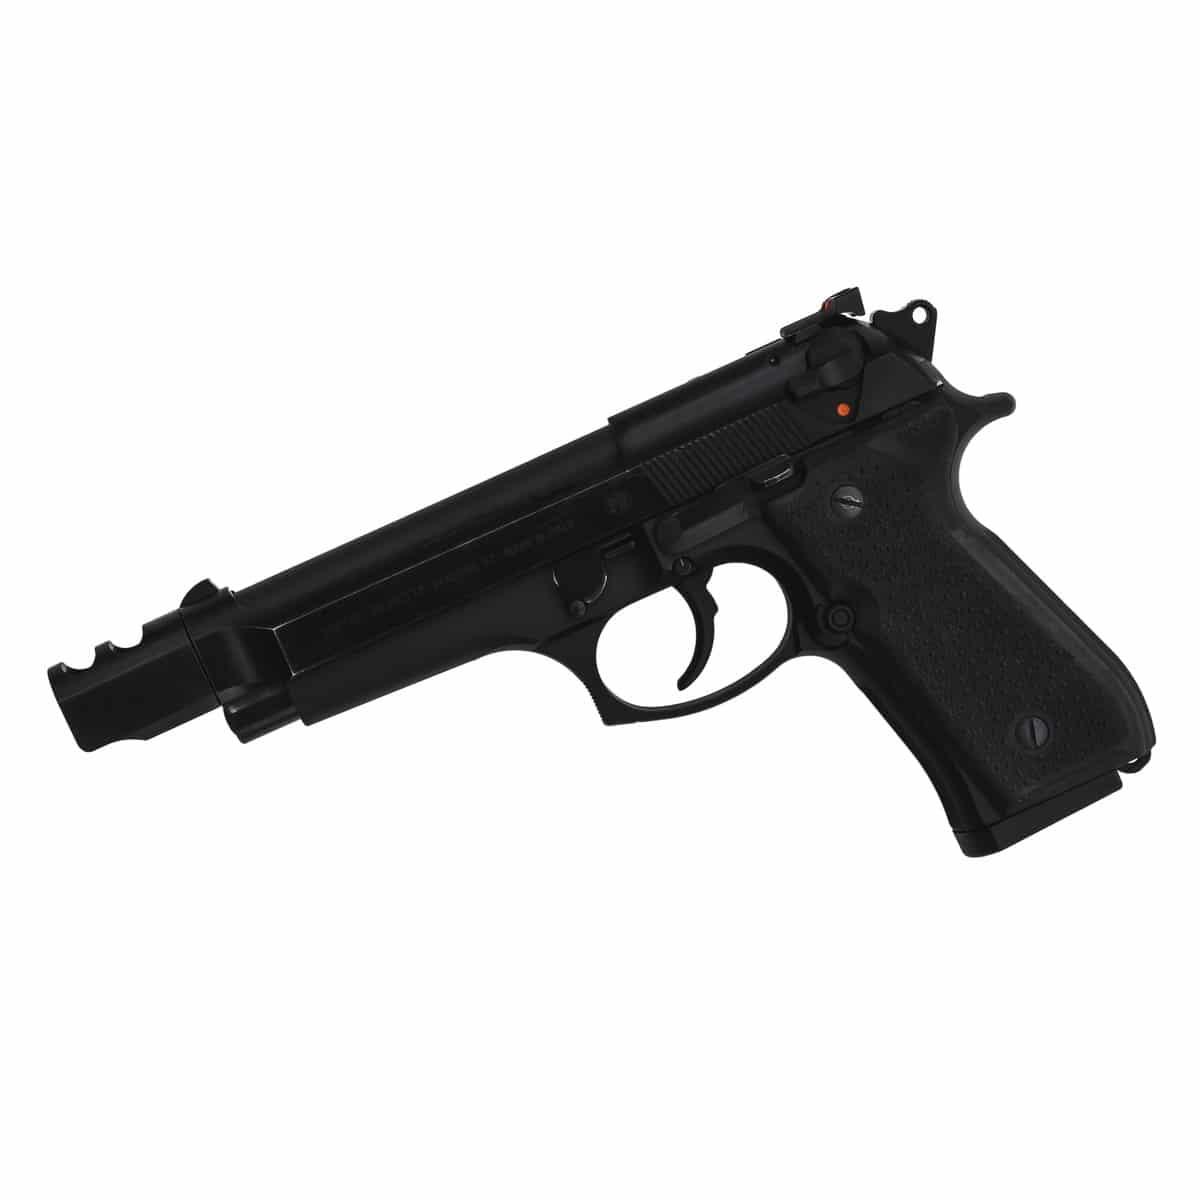 m9-half-profile-compensator